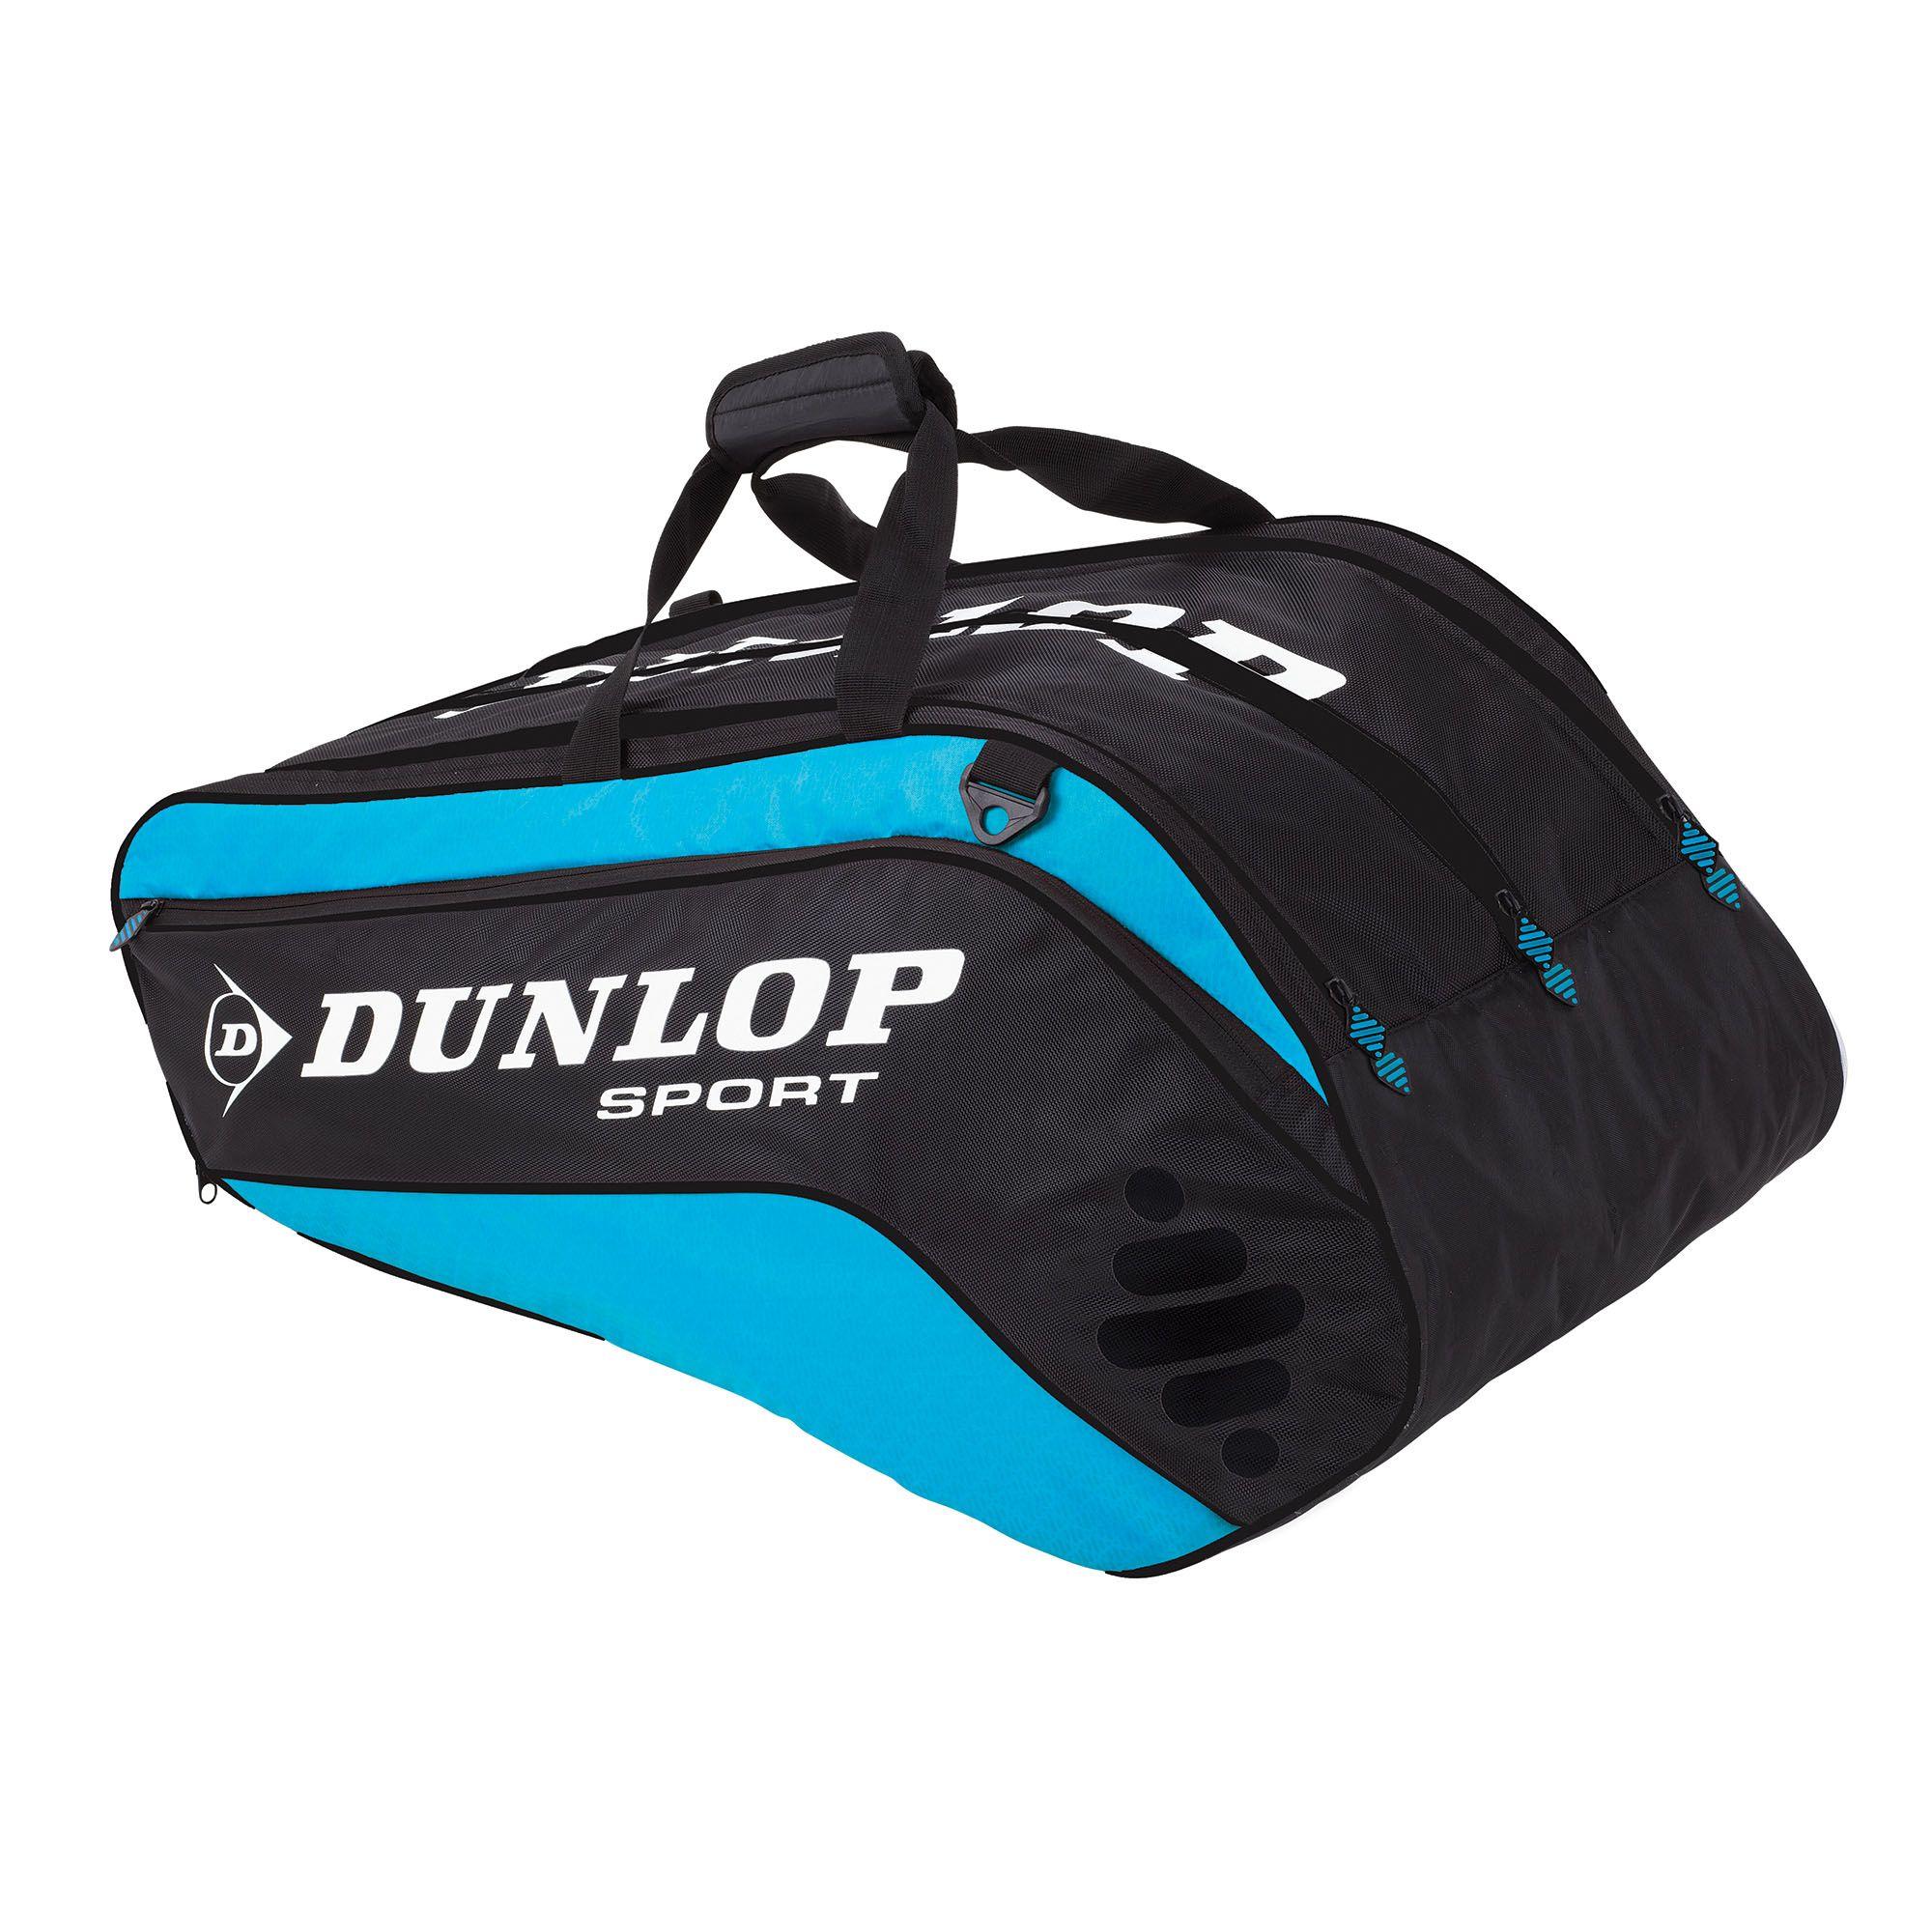 Dunlop Biomimetic Tour 10 Racket Thermo Bag Sweatband Com